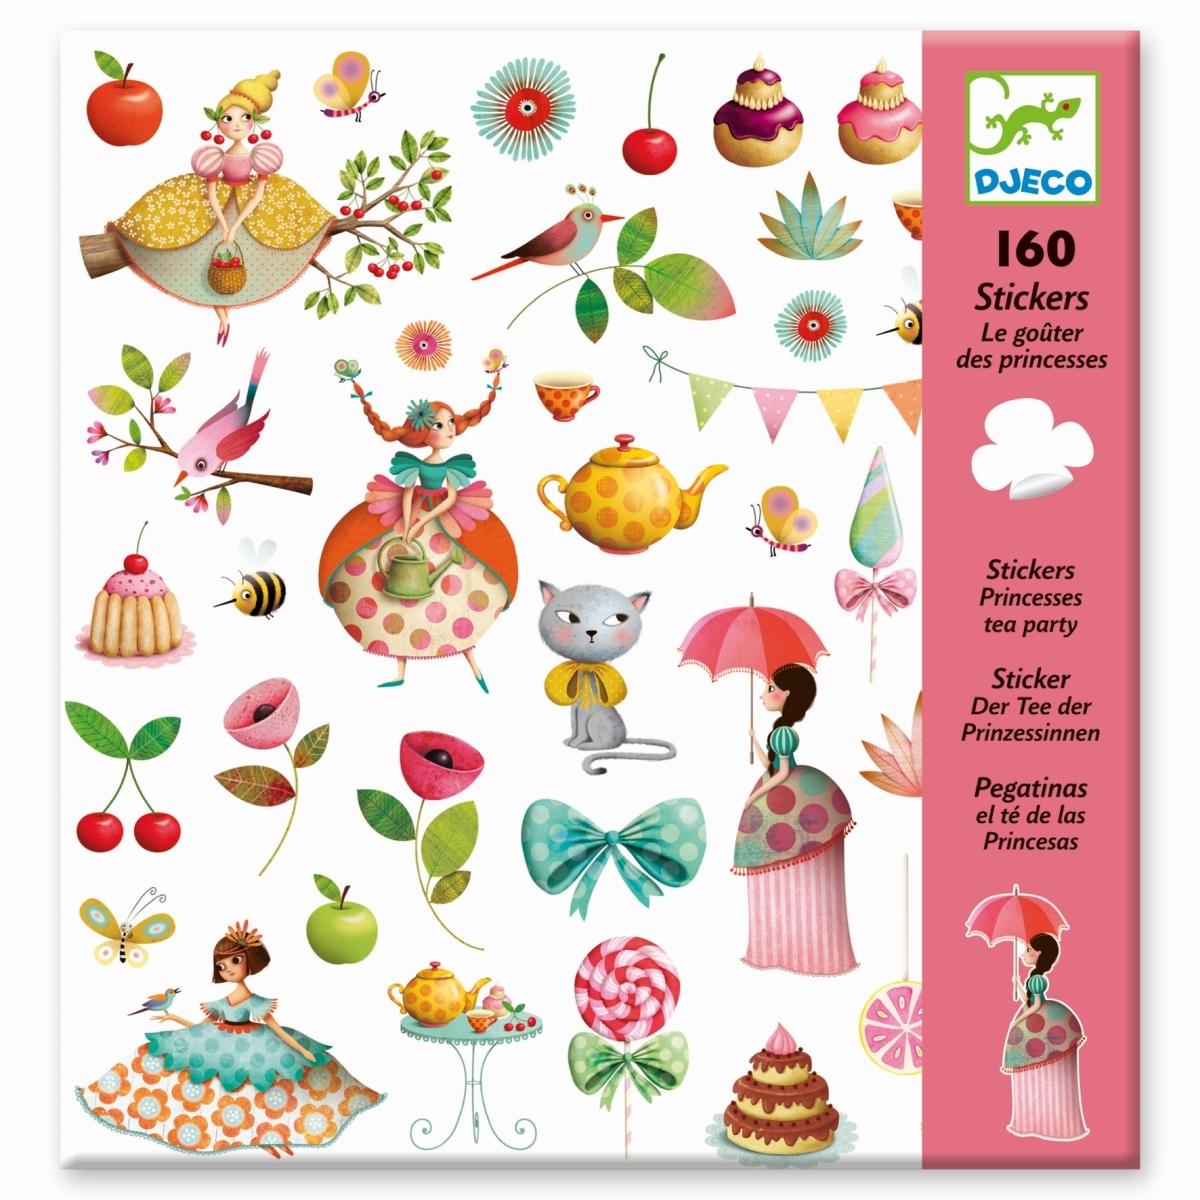 Sticker Princess Tea Party